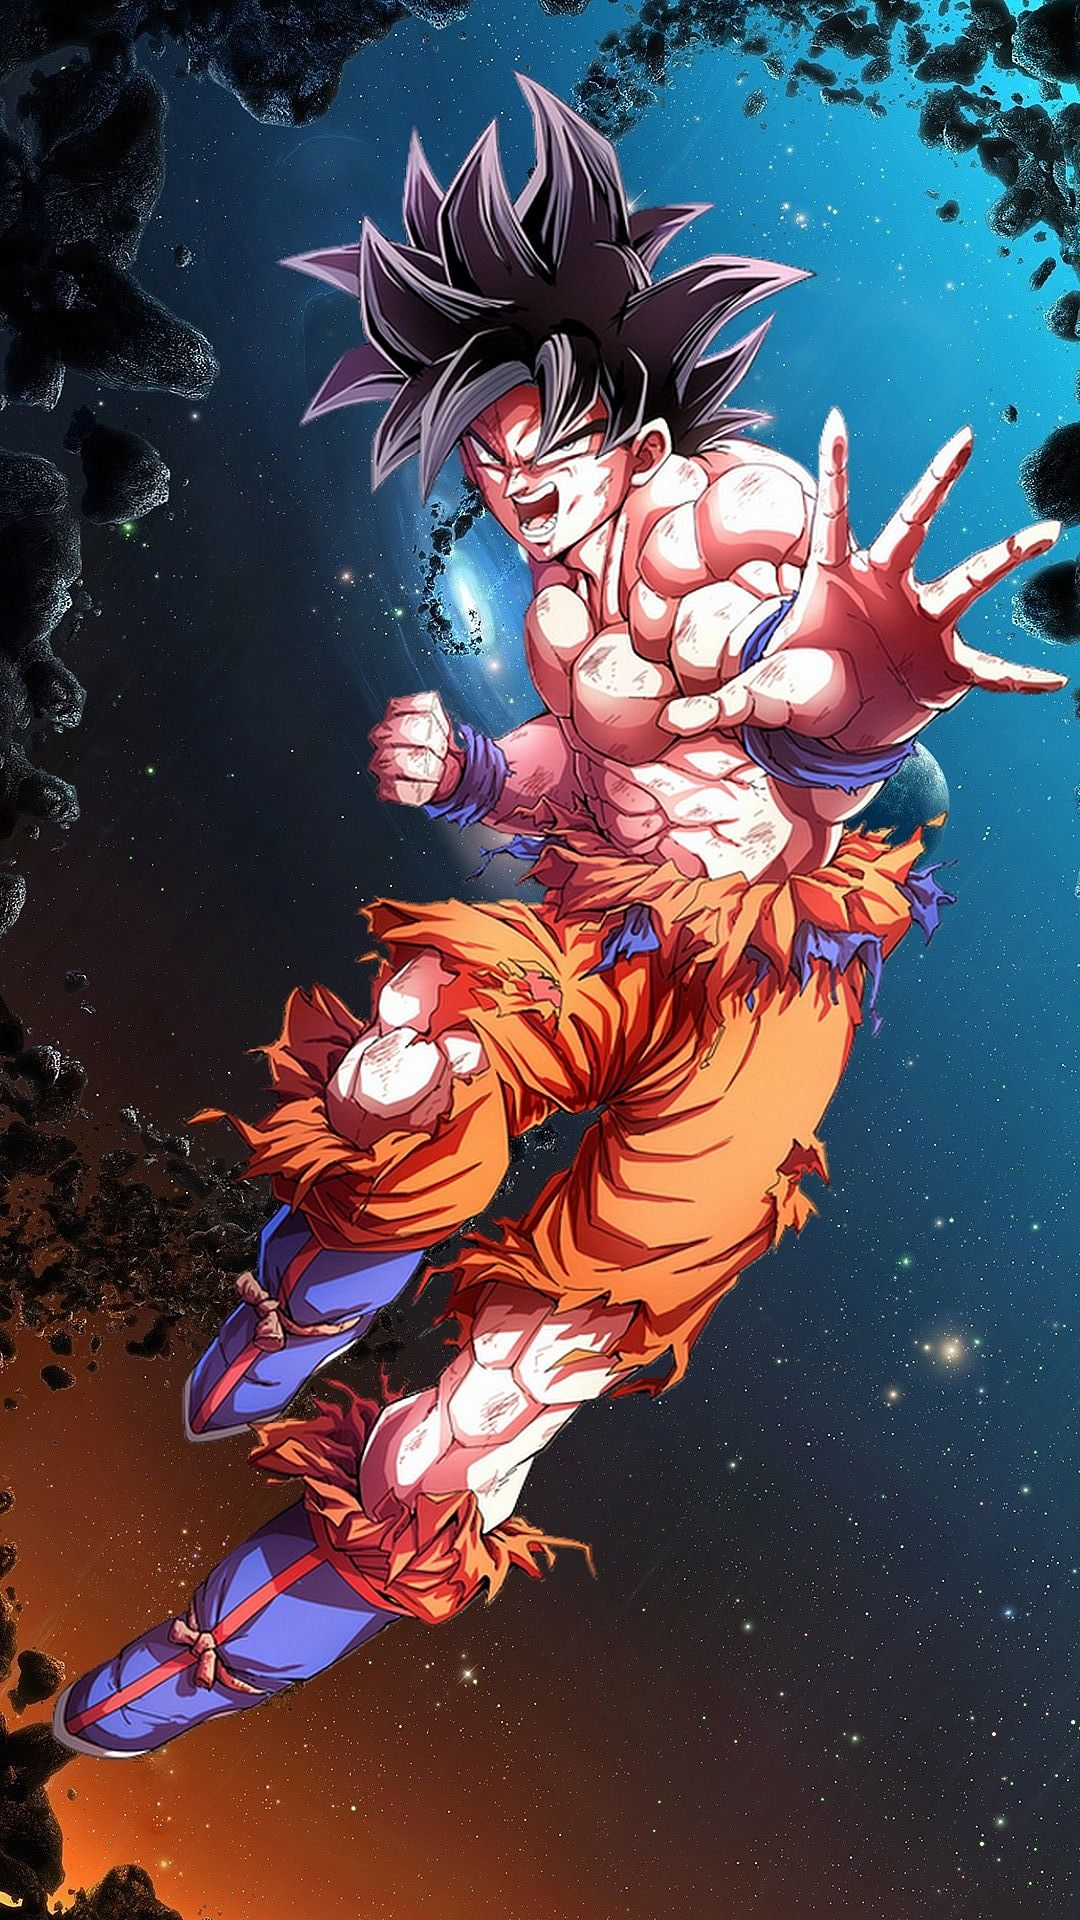 Goku Mastered Ultra Instinct Wallpaper 8k